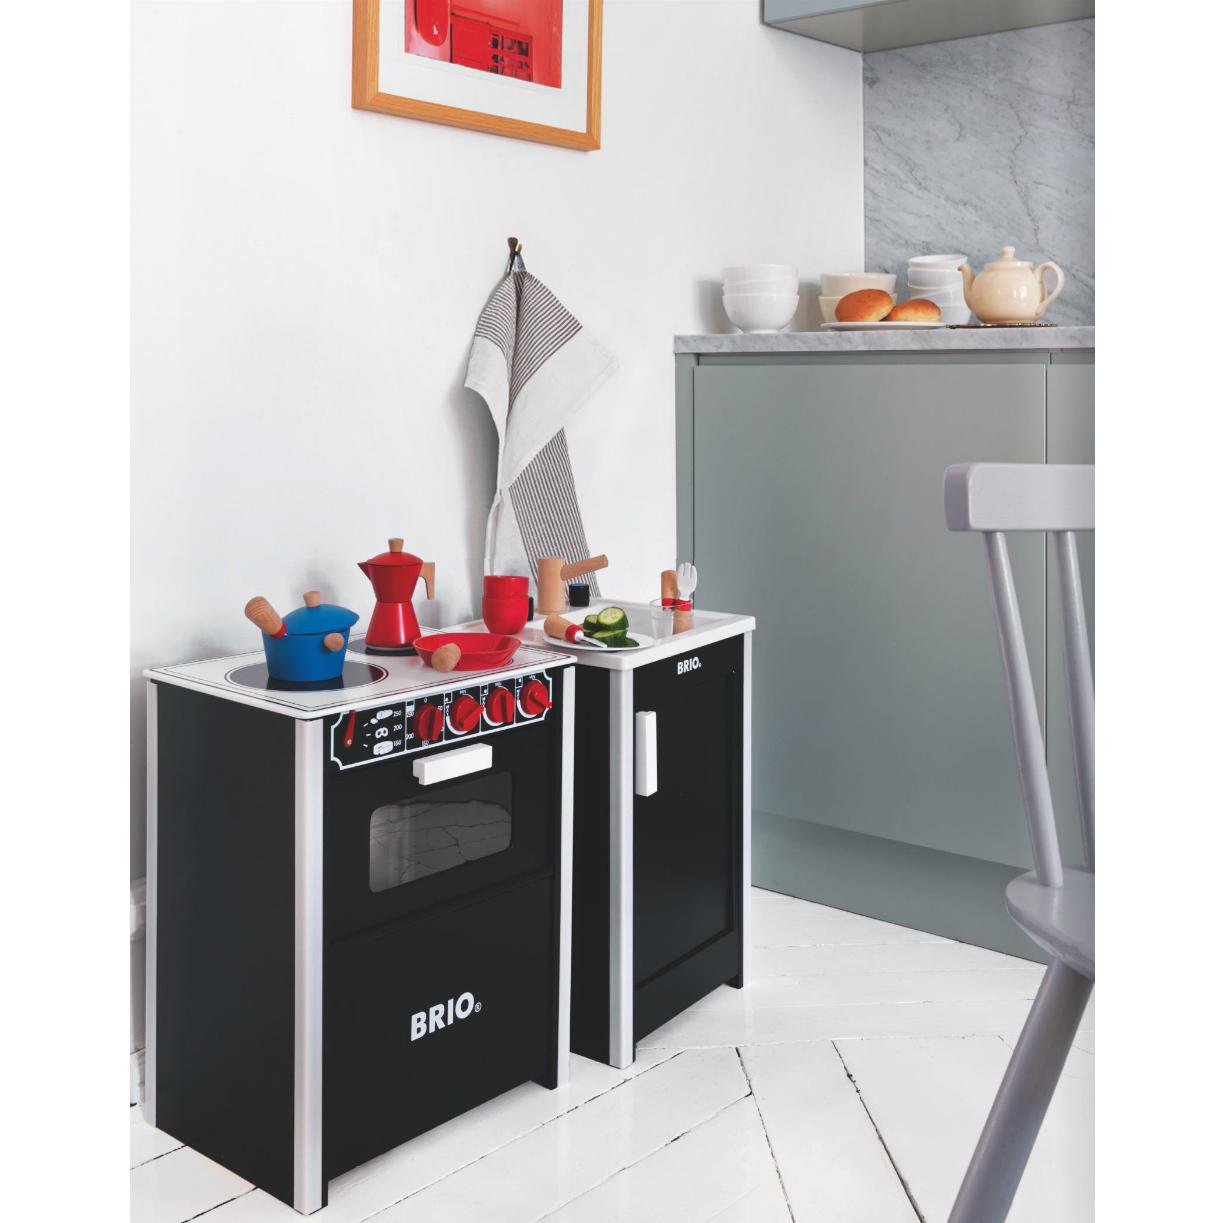 cuisiniere rouge. Black Bedroom Furniture Sets. Home Design Ideas